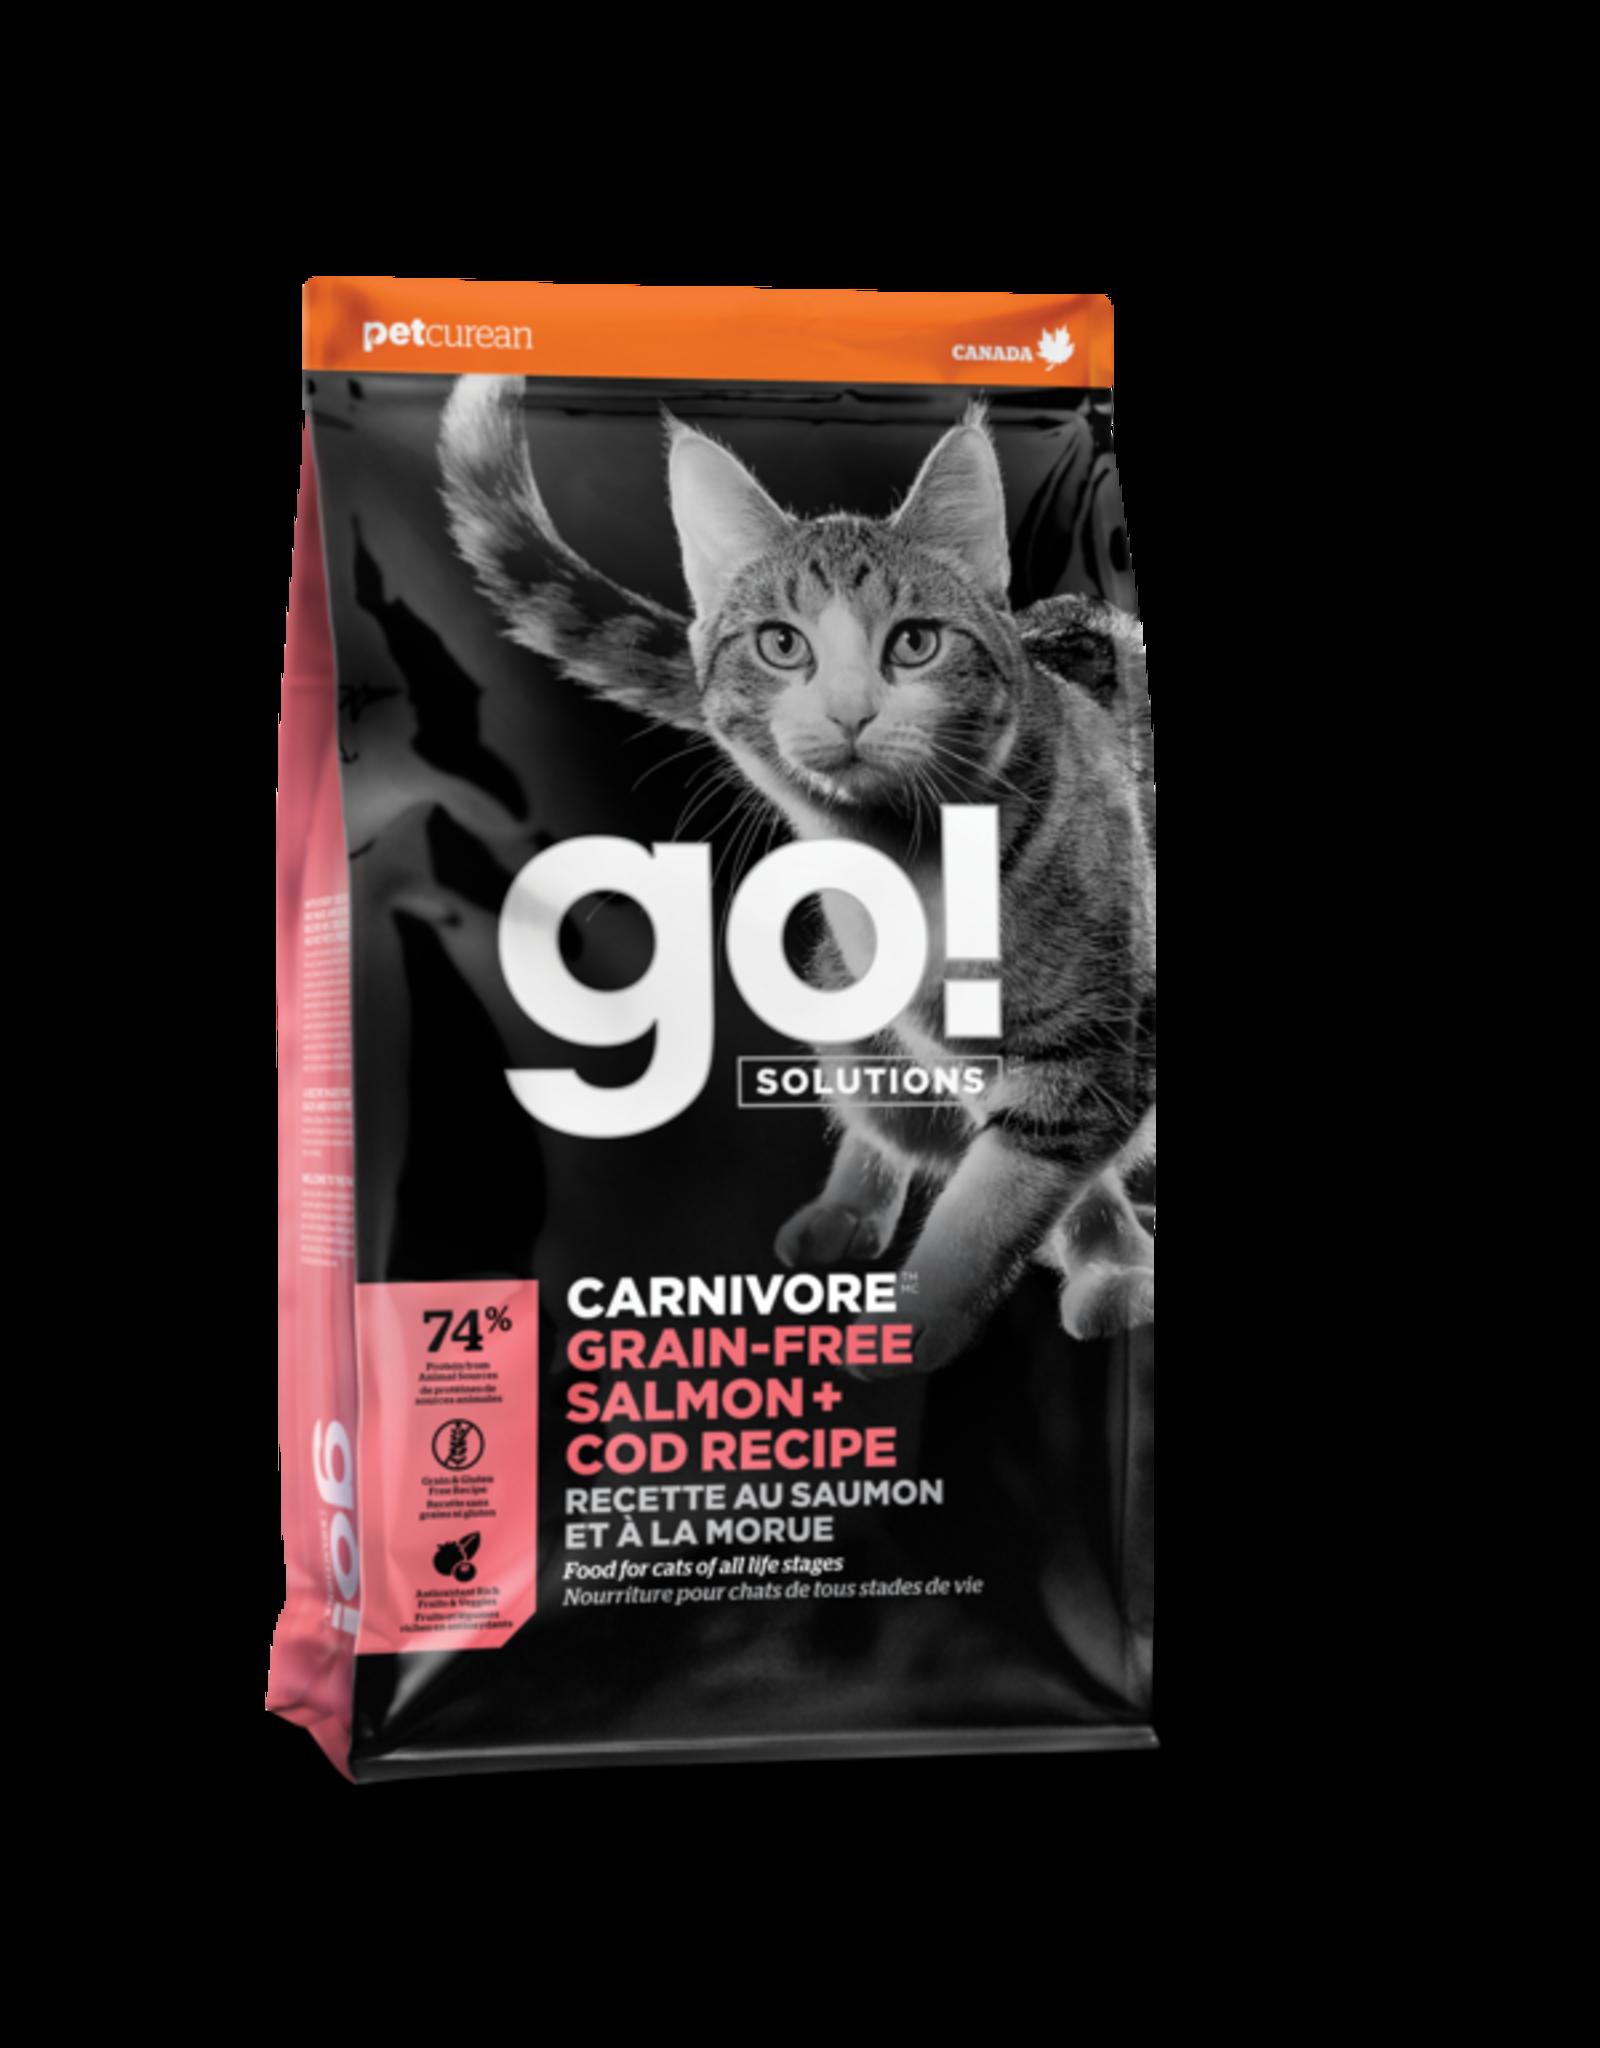 Petcurean Petcurean Go! Carnivore Grain-Free Salmon & Cod Recipe Cat Food 3lb